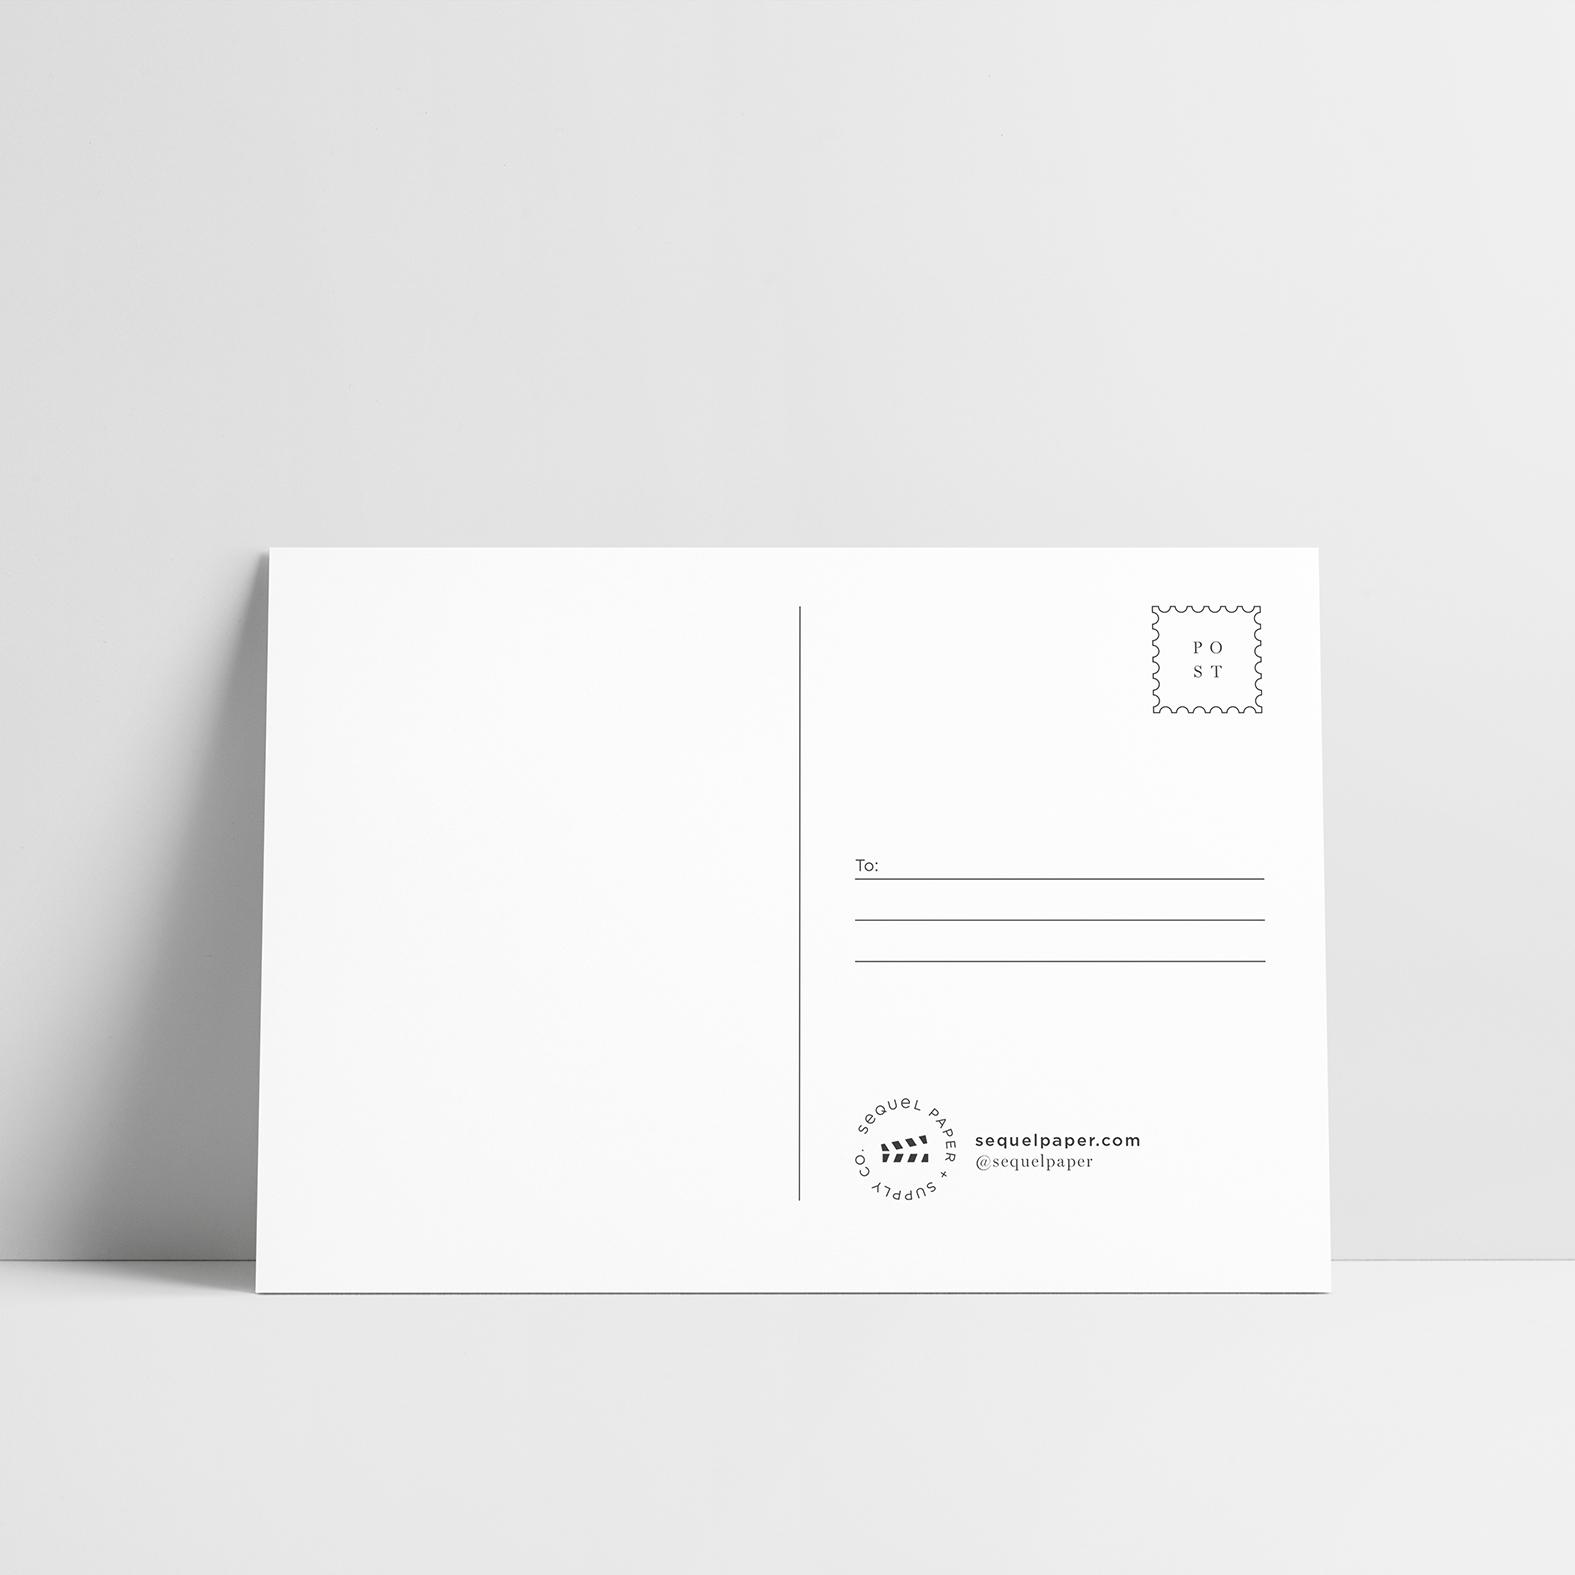 Postcard Mockup Grey 9.jpg